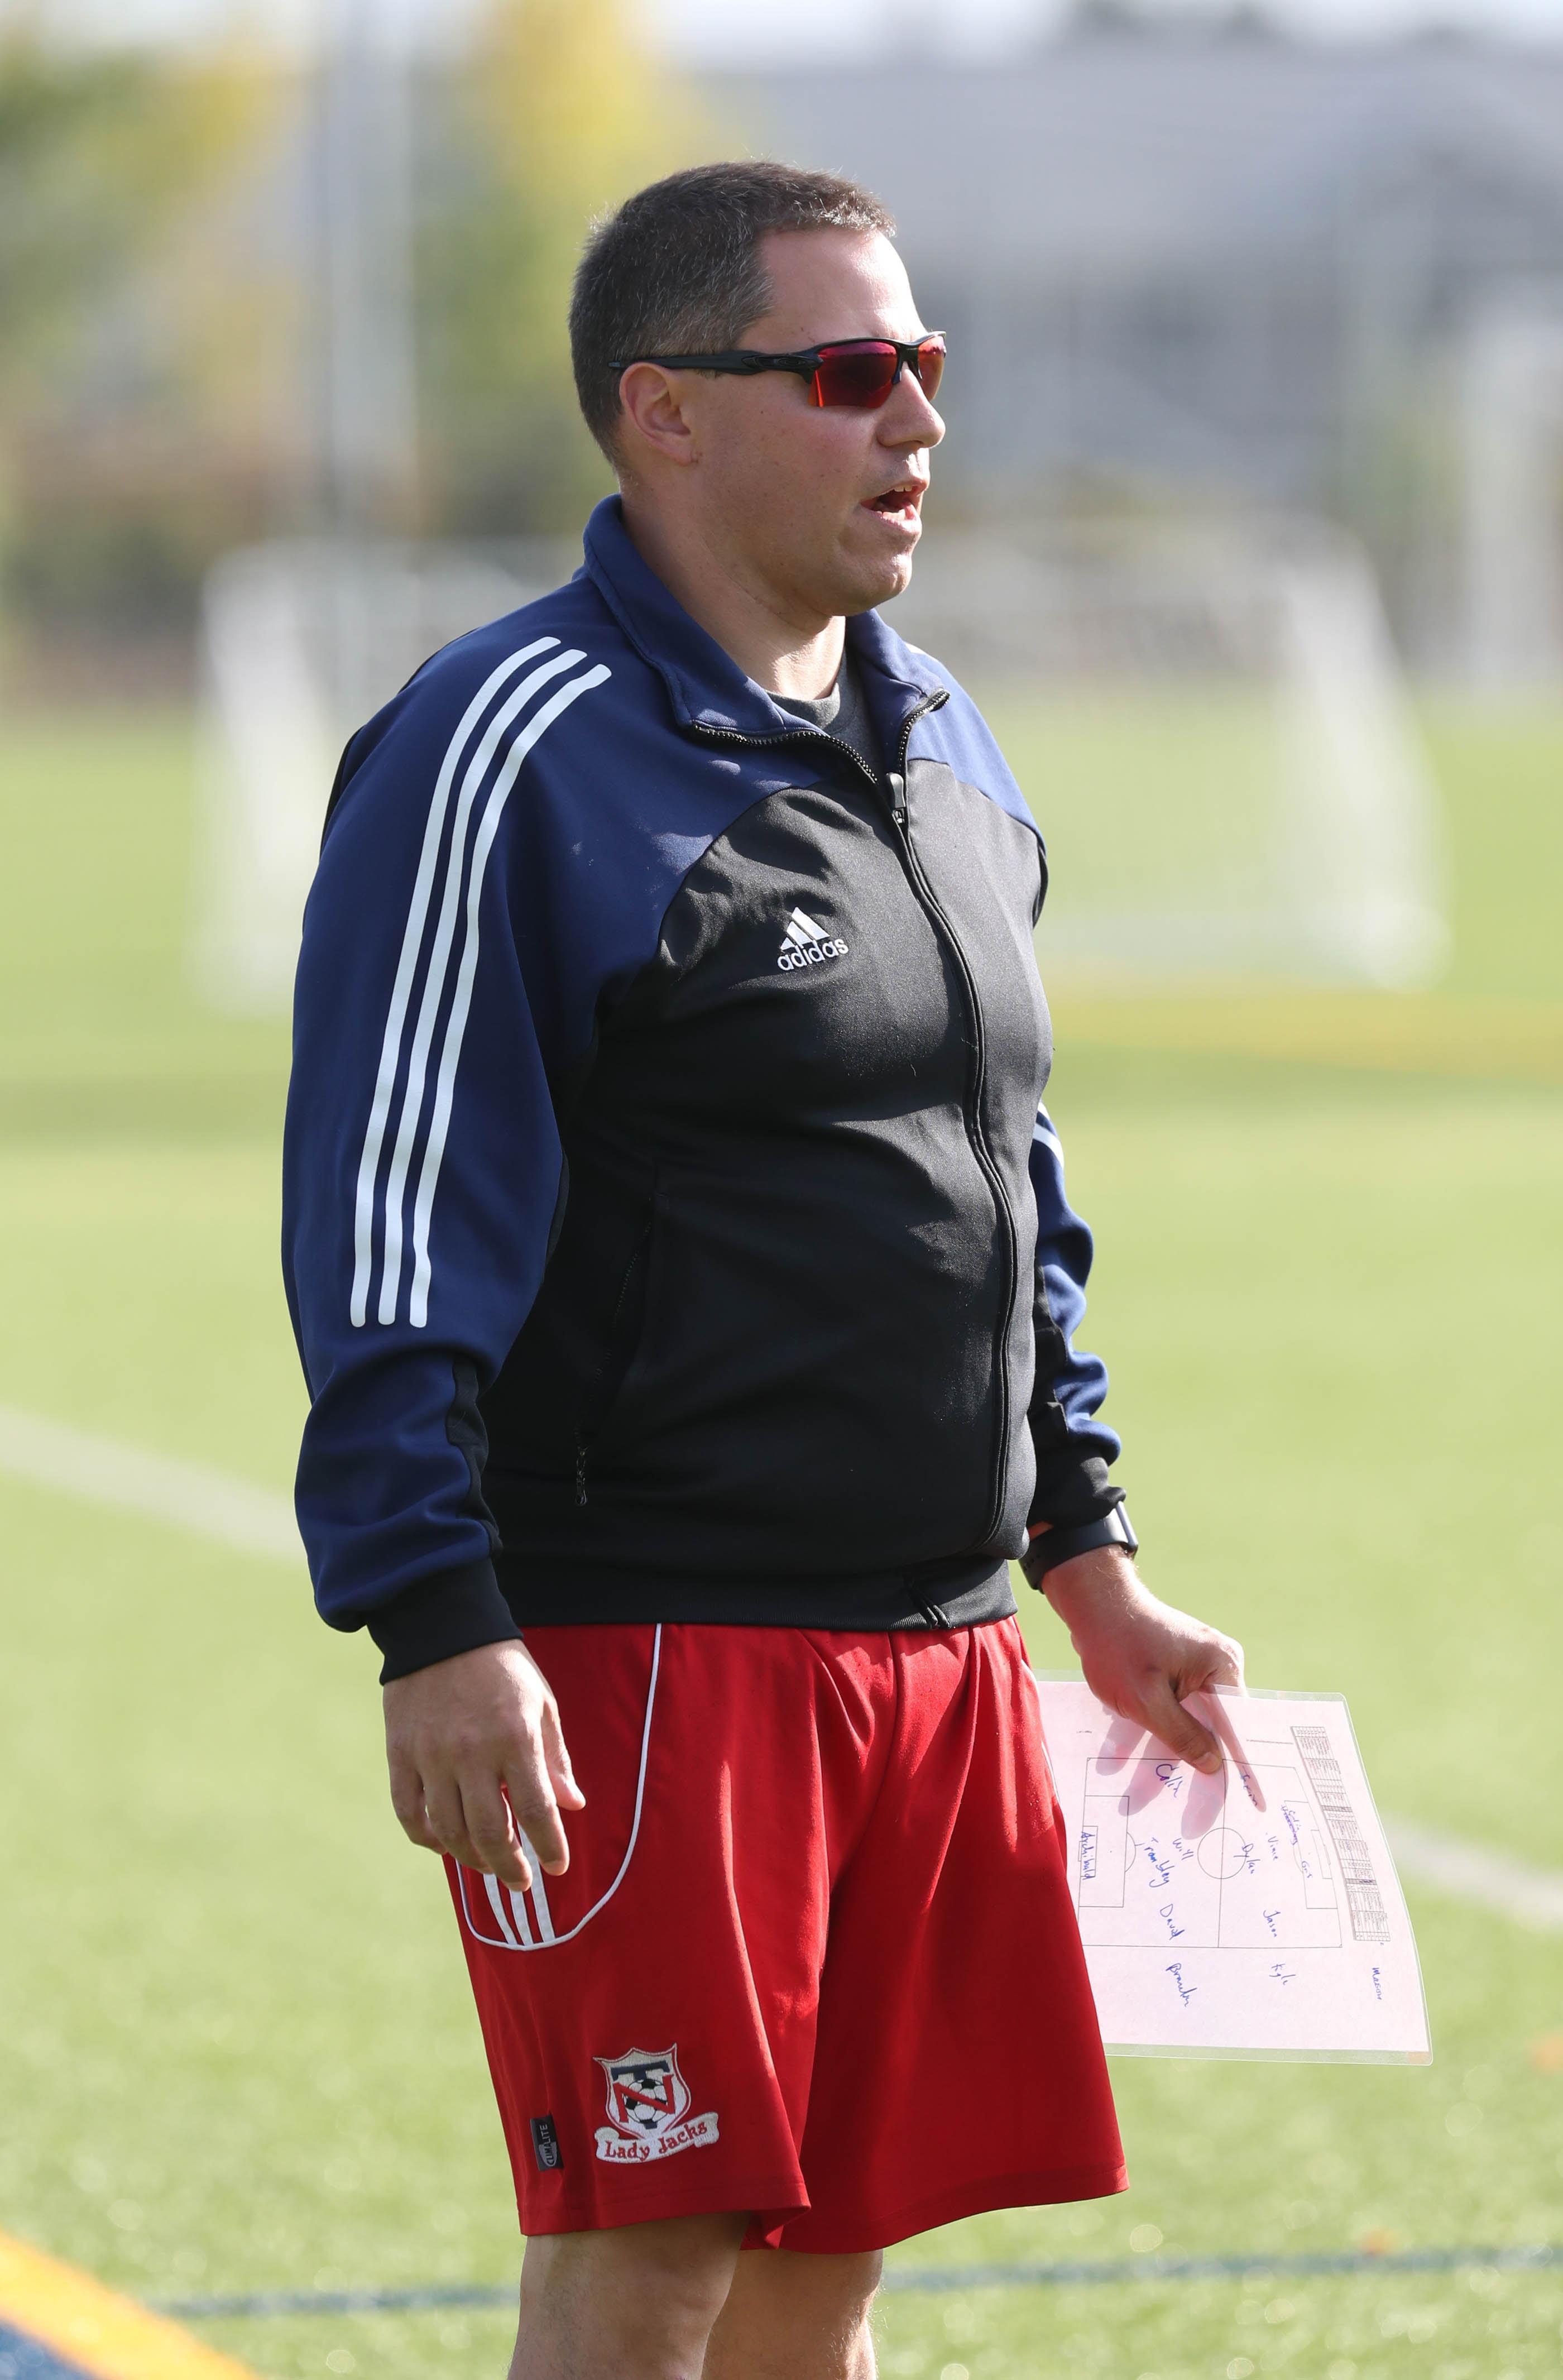 Steve Sabo looks to get the North Tonawanda boys soccer team on a path toward respectability. He has a strong coaching resume, having guided NT's girls soccer program to 185 wins over 17 seasons. (James P. McCoy/ Buffalo News)